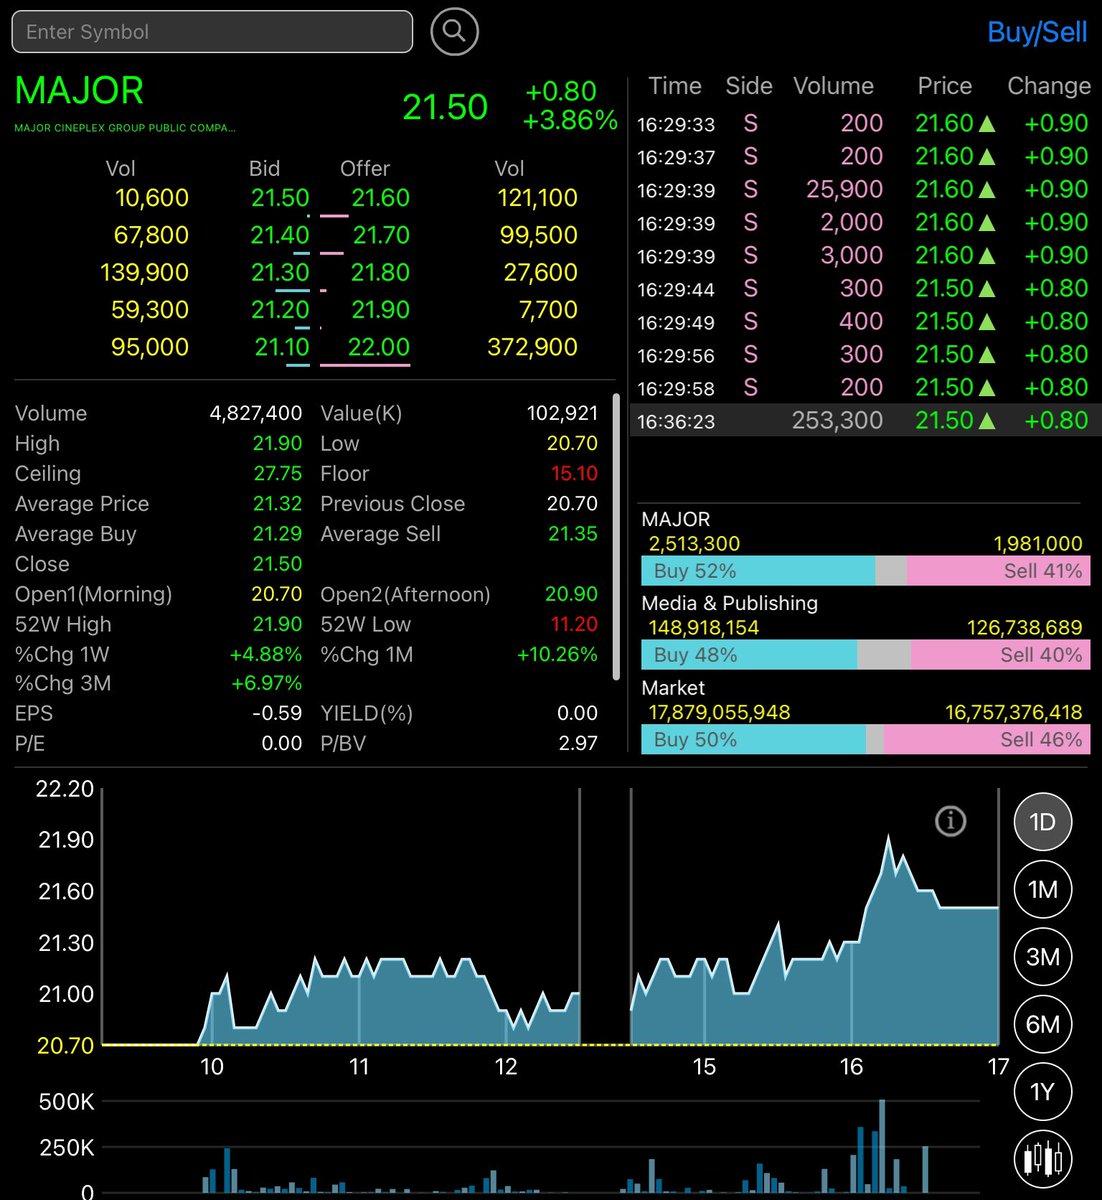 Major จับมือกับ zipmex ใช้ Bitcoin จ่ายแทนเงินสด (Fiat money) สาขาที่แรกที่เริ่มให้บริการ สาขารัชโยธิน  #bitcoin #major